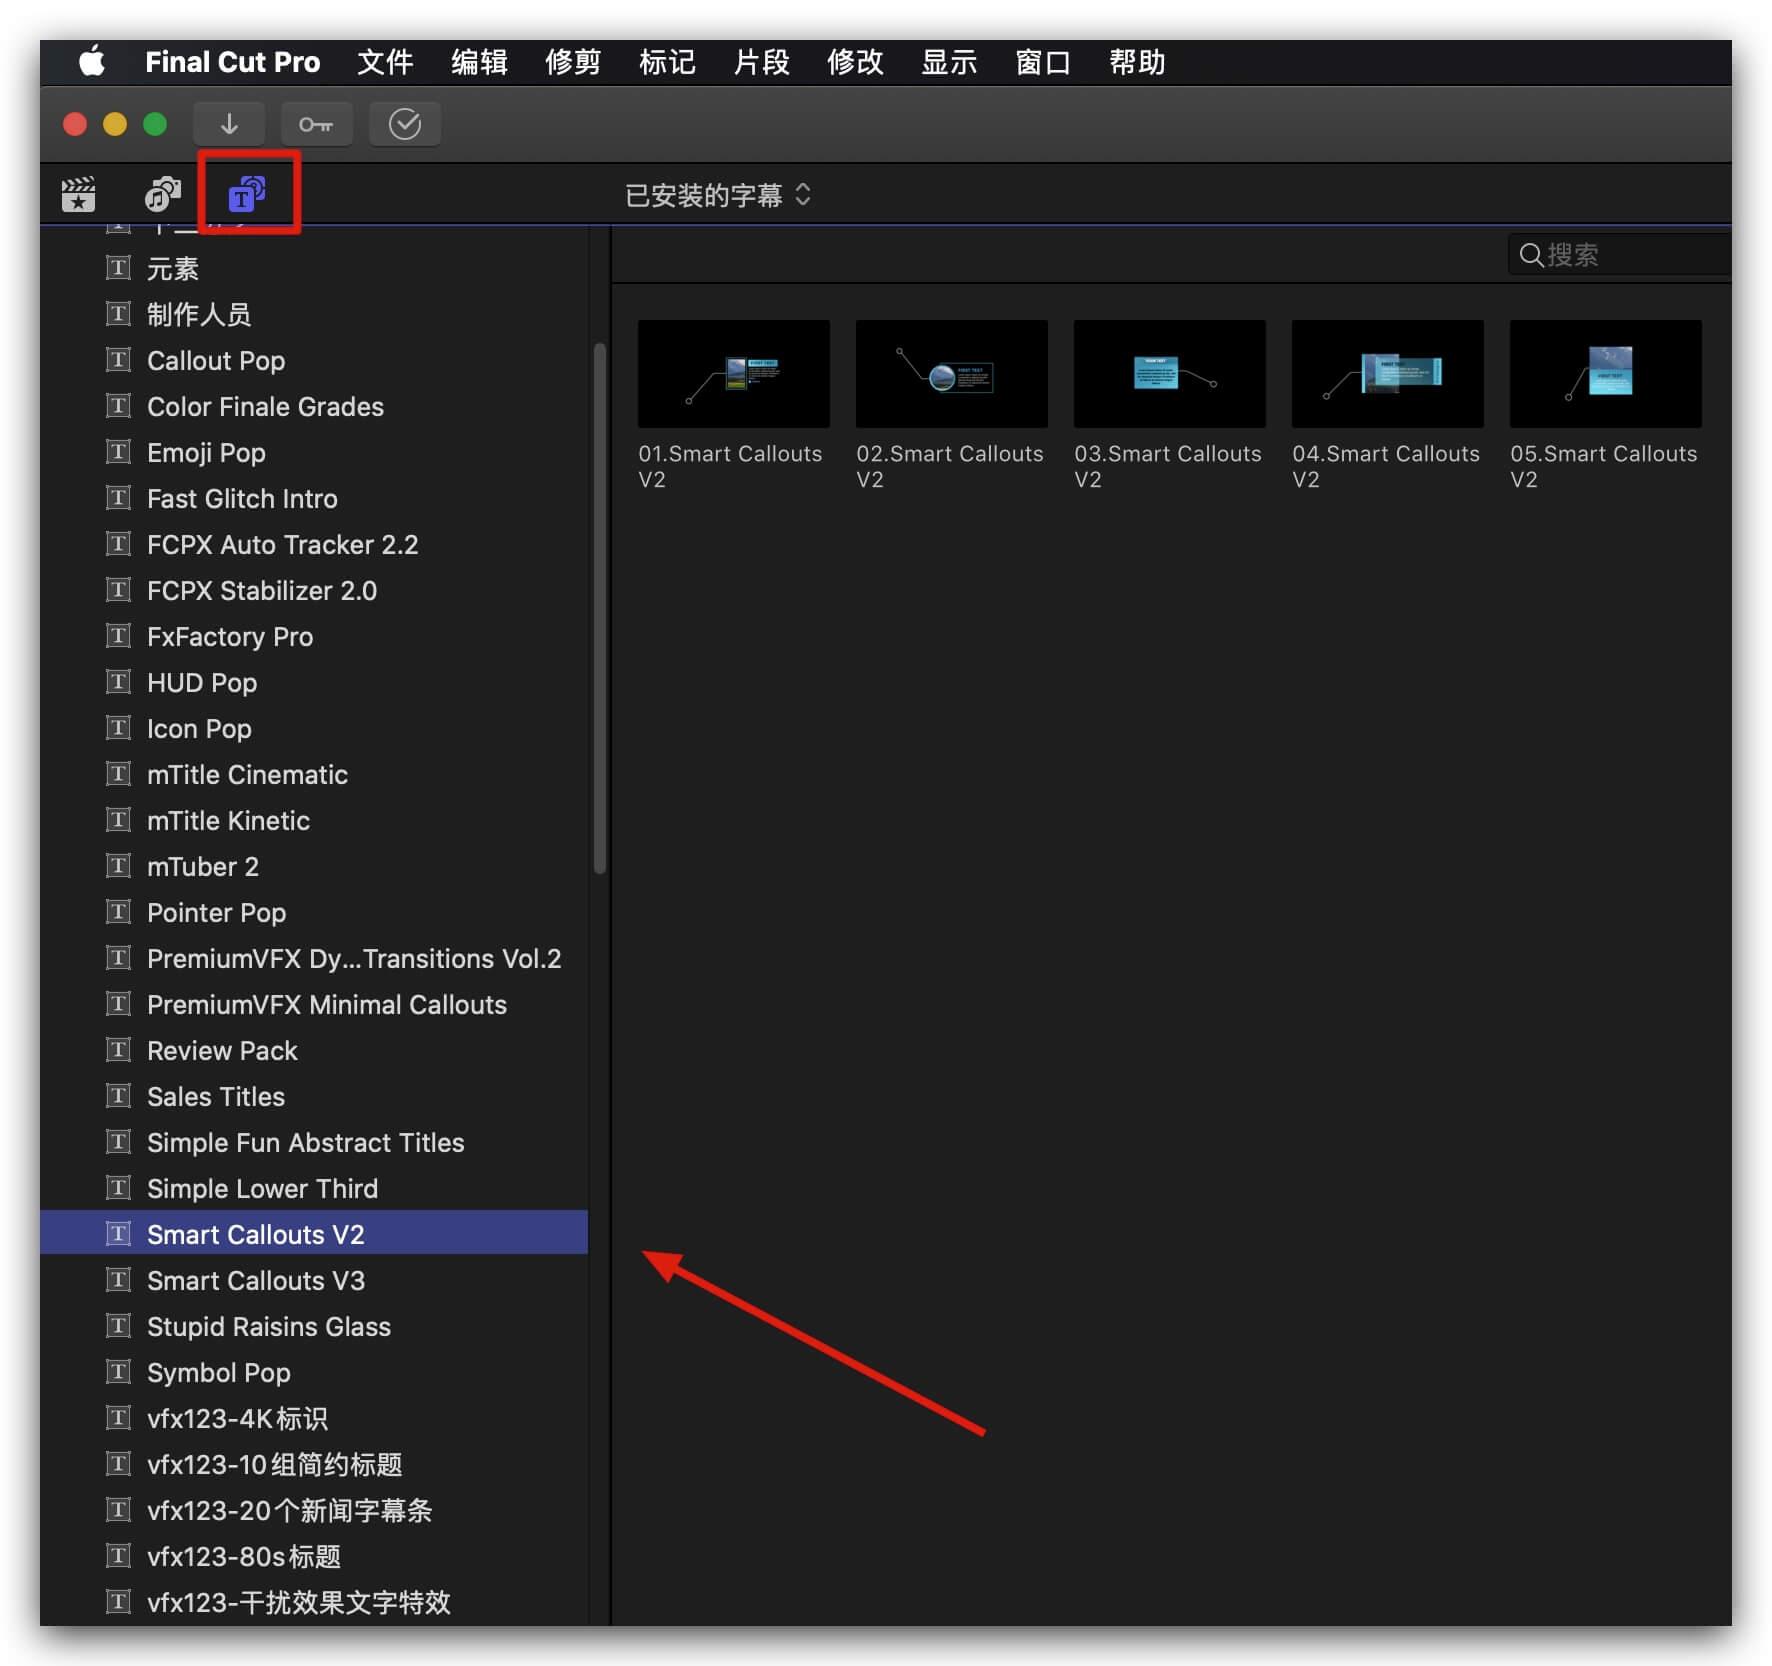 fcpx插件 线条呼出标题版动画模板可插入图片 Smart Callout Titles V2